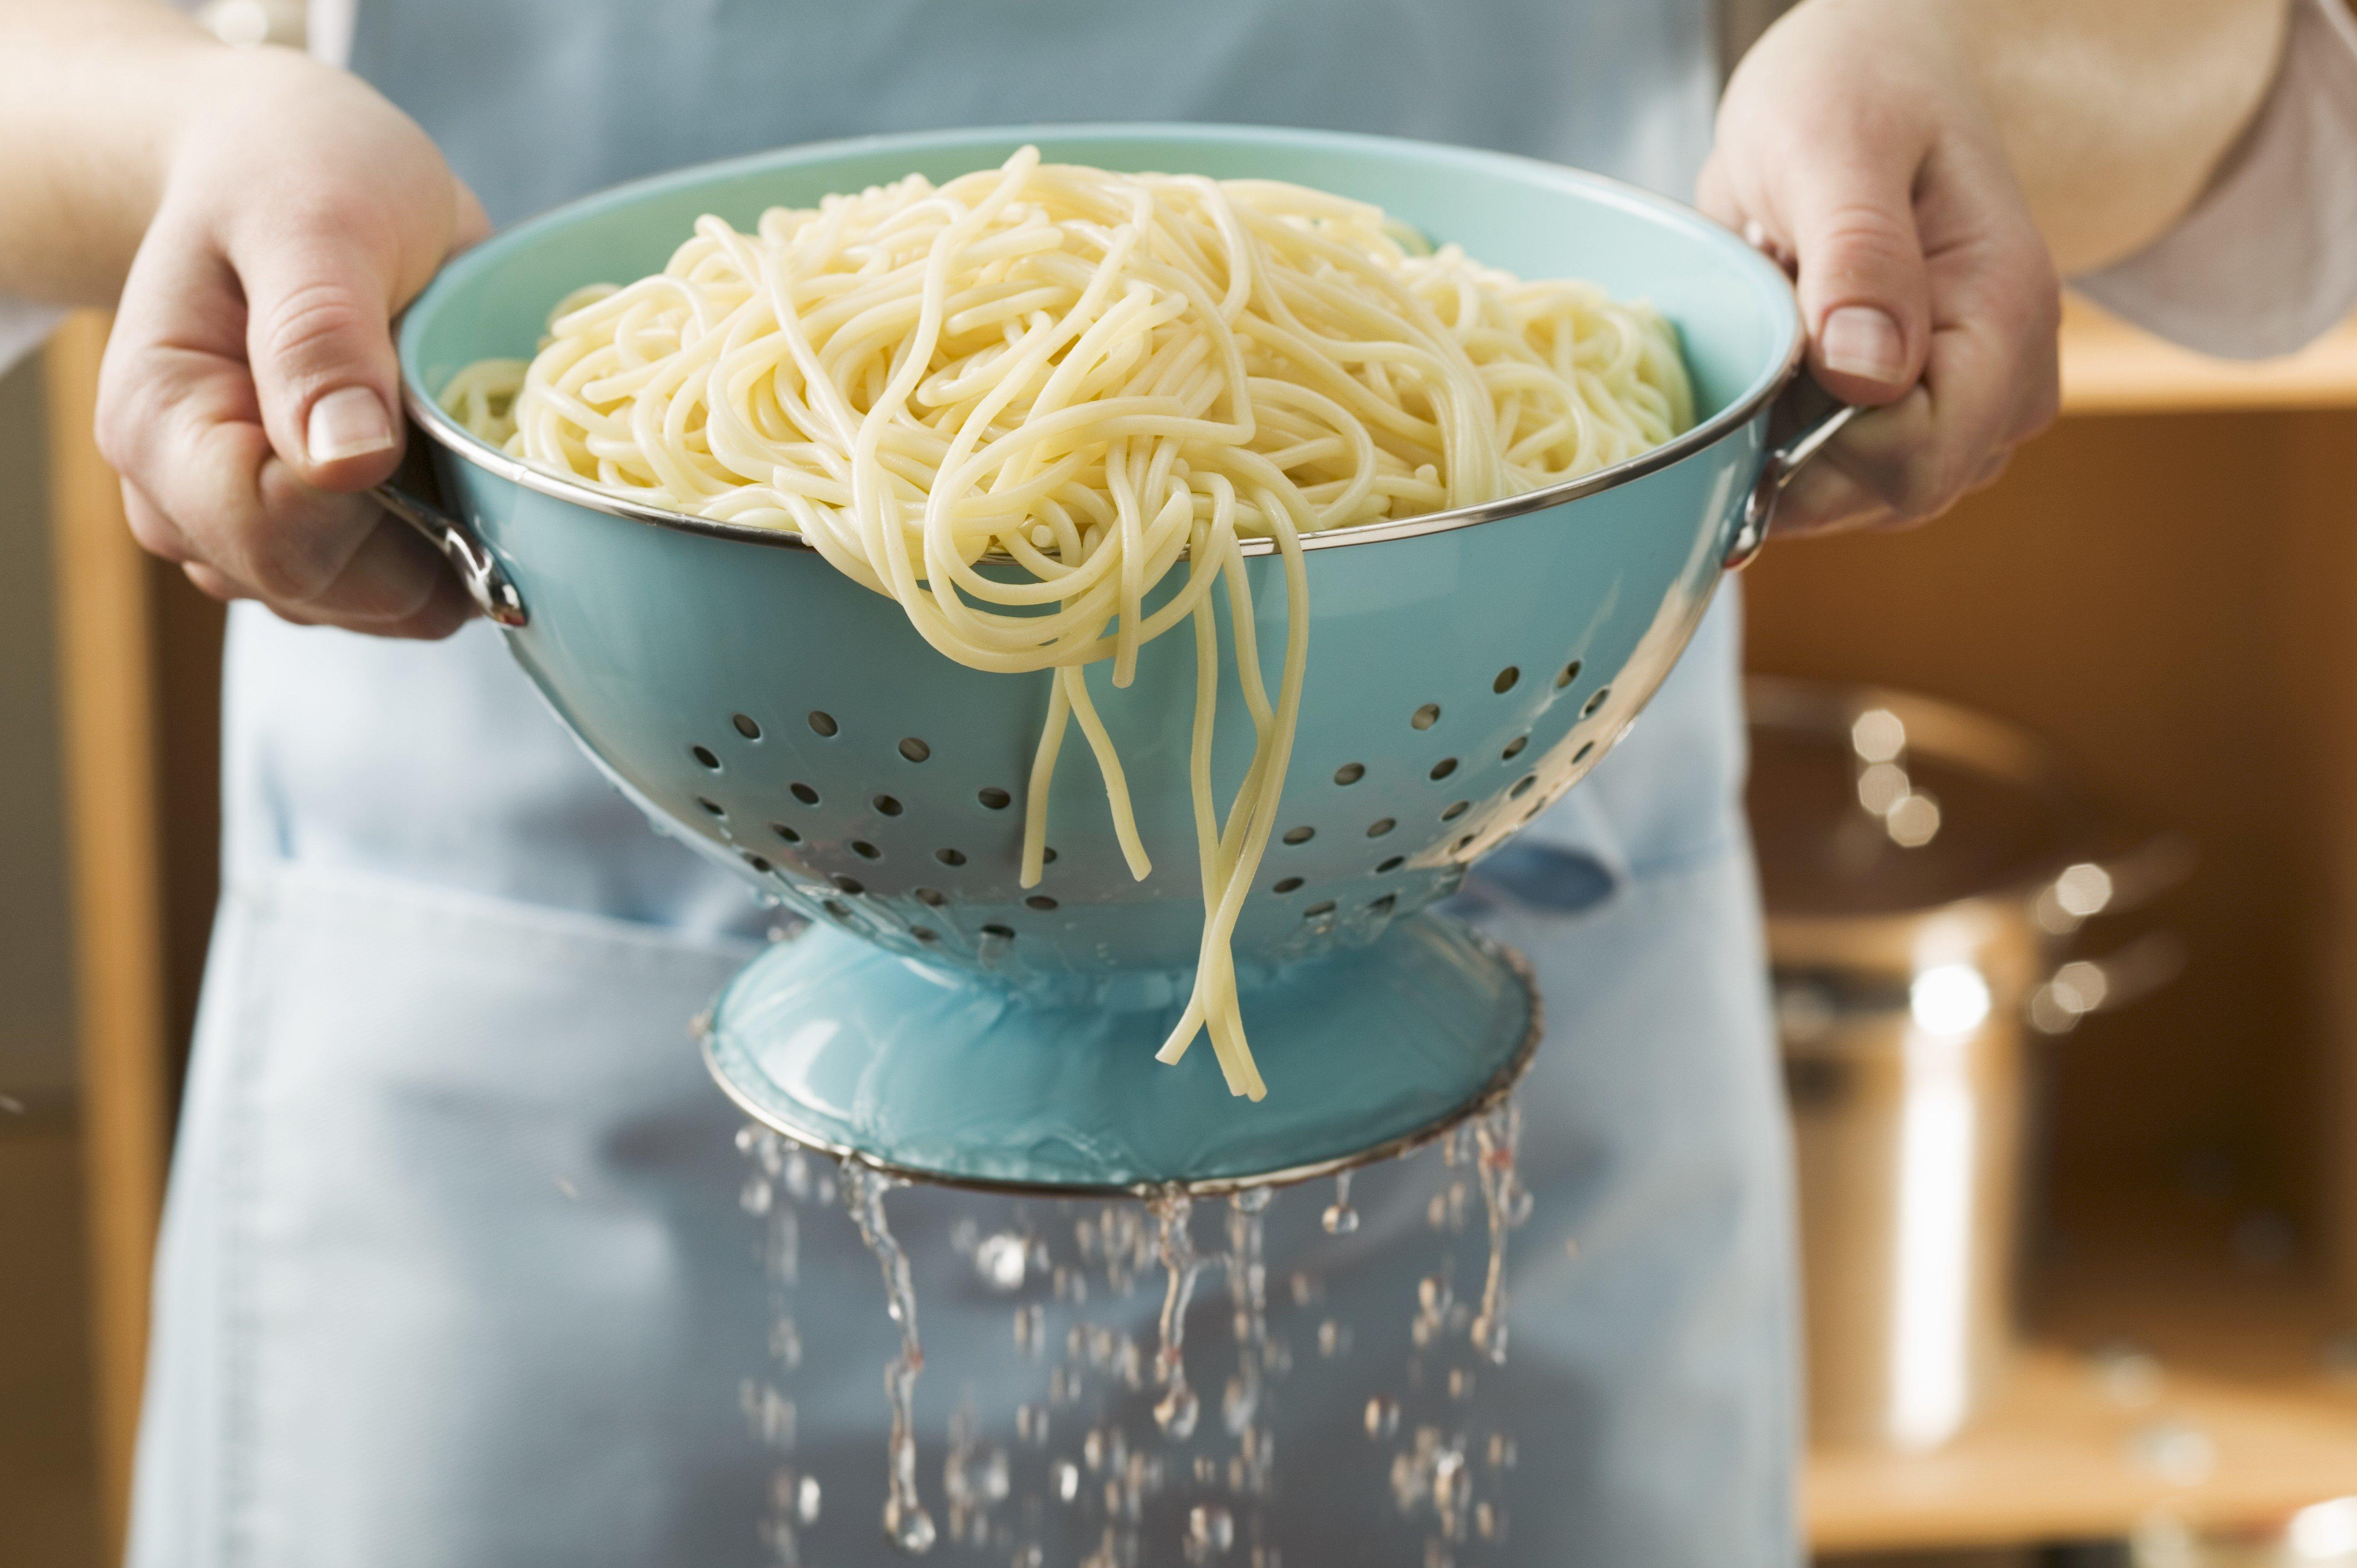 Draining cooked spaghetti